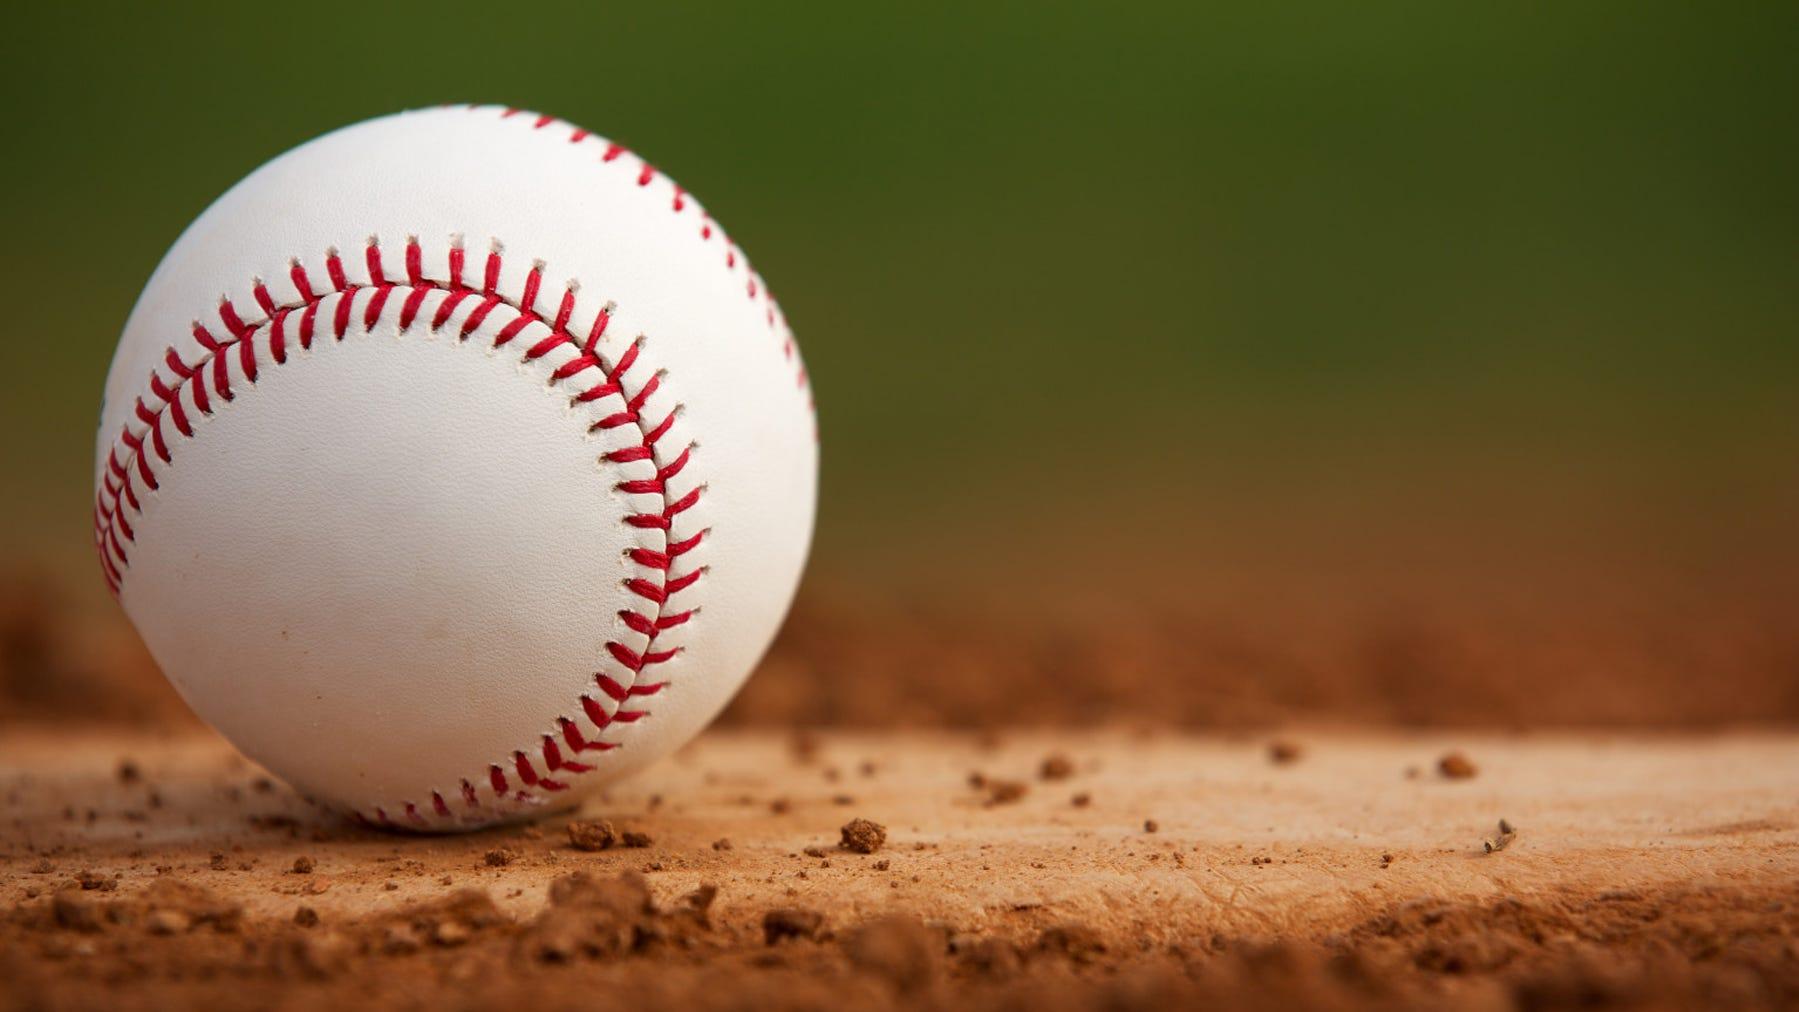 91e74c75 12fd 40b2 9402 493f8e956fd7 Baseball jpg?crop=1799,1012,x0,y40&width=1799&height=1012&format=pjpg&auto=webp.